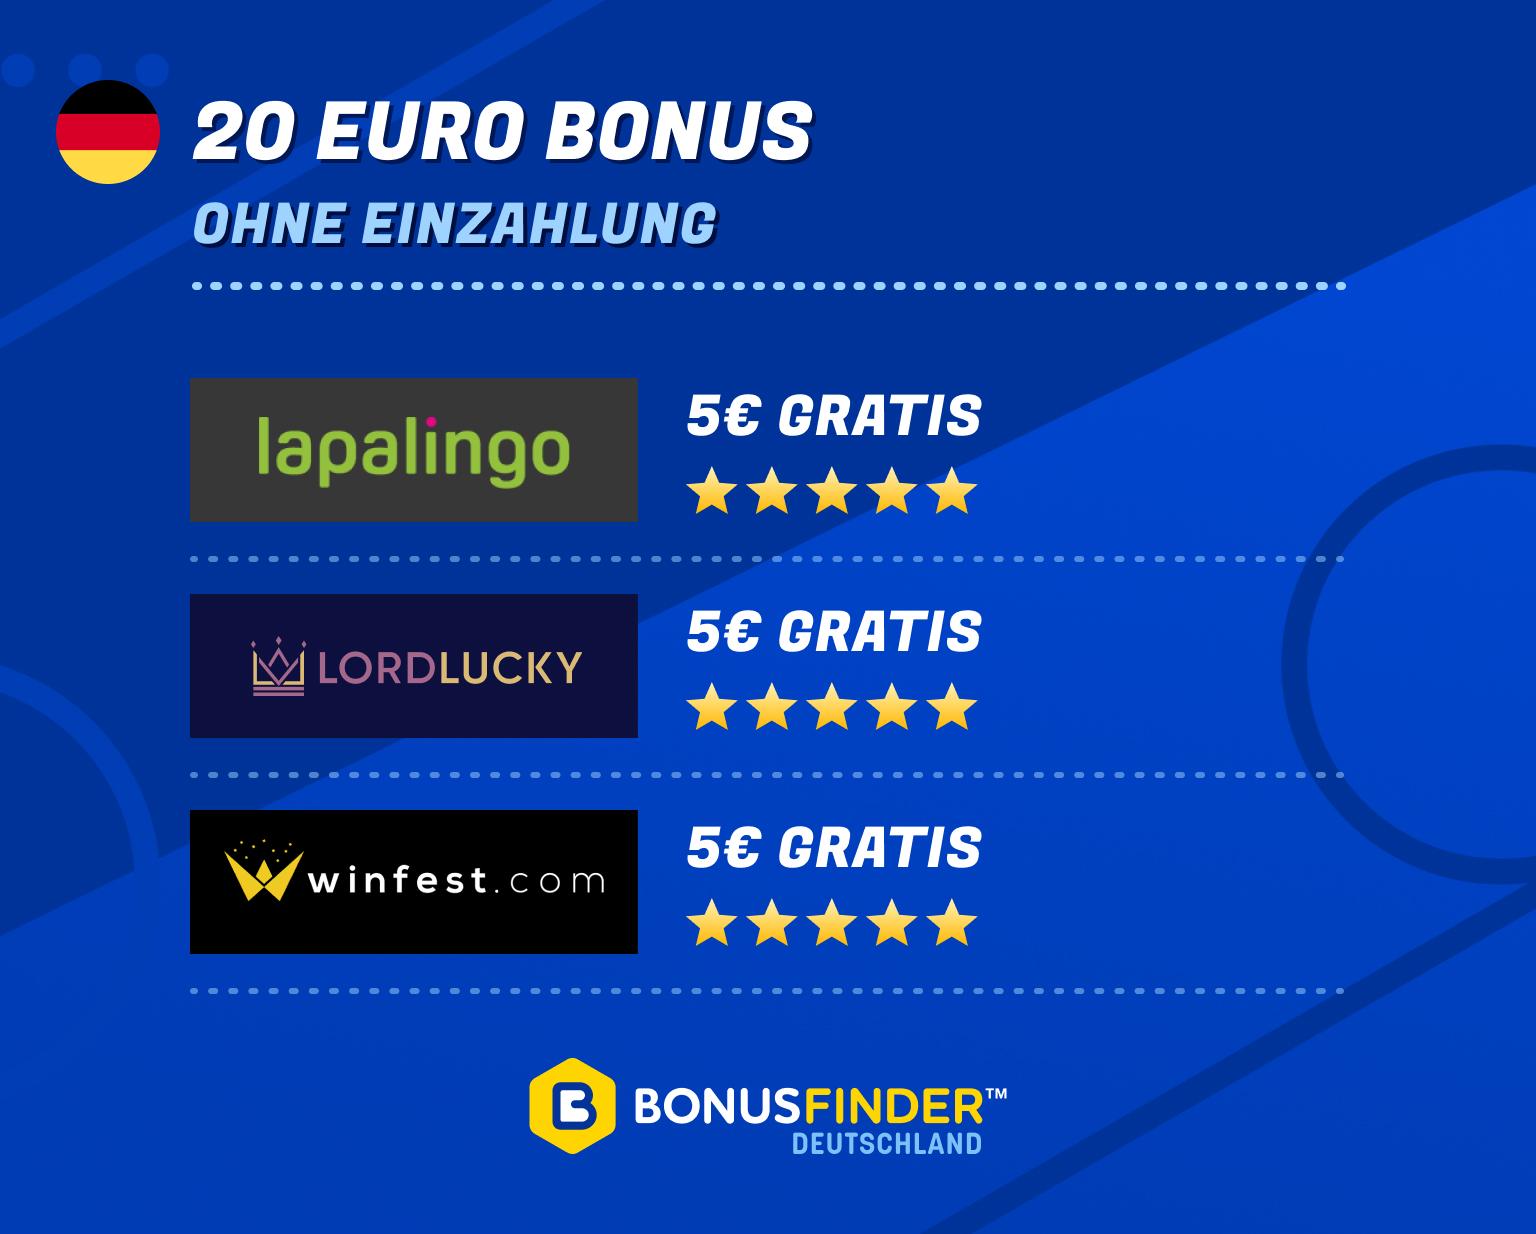 20 euro bonus ohne einzahlung casino